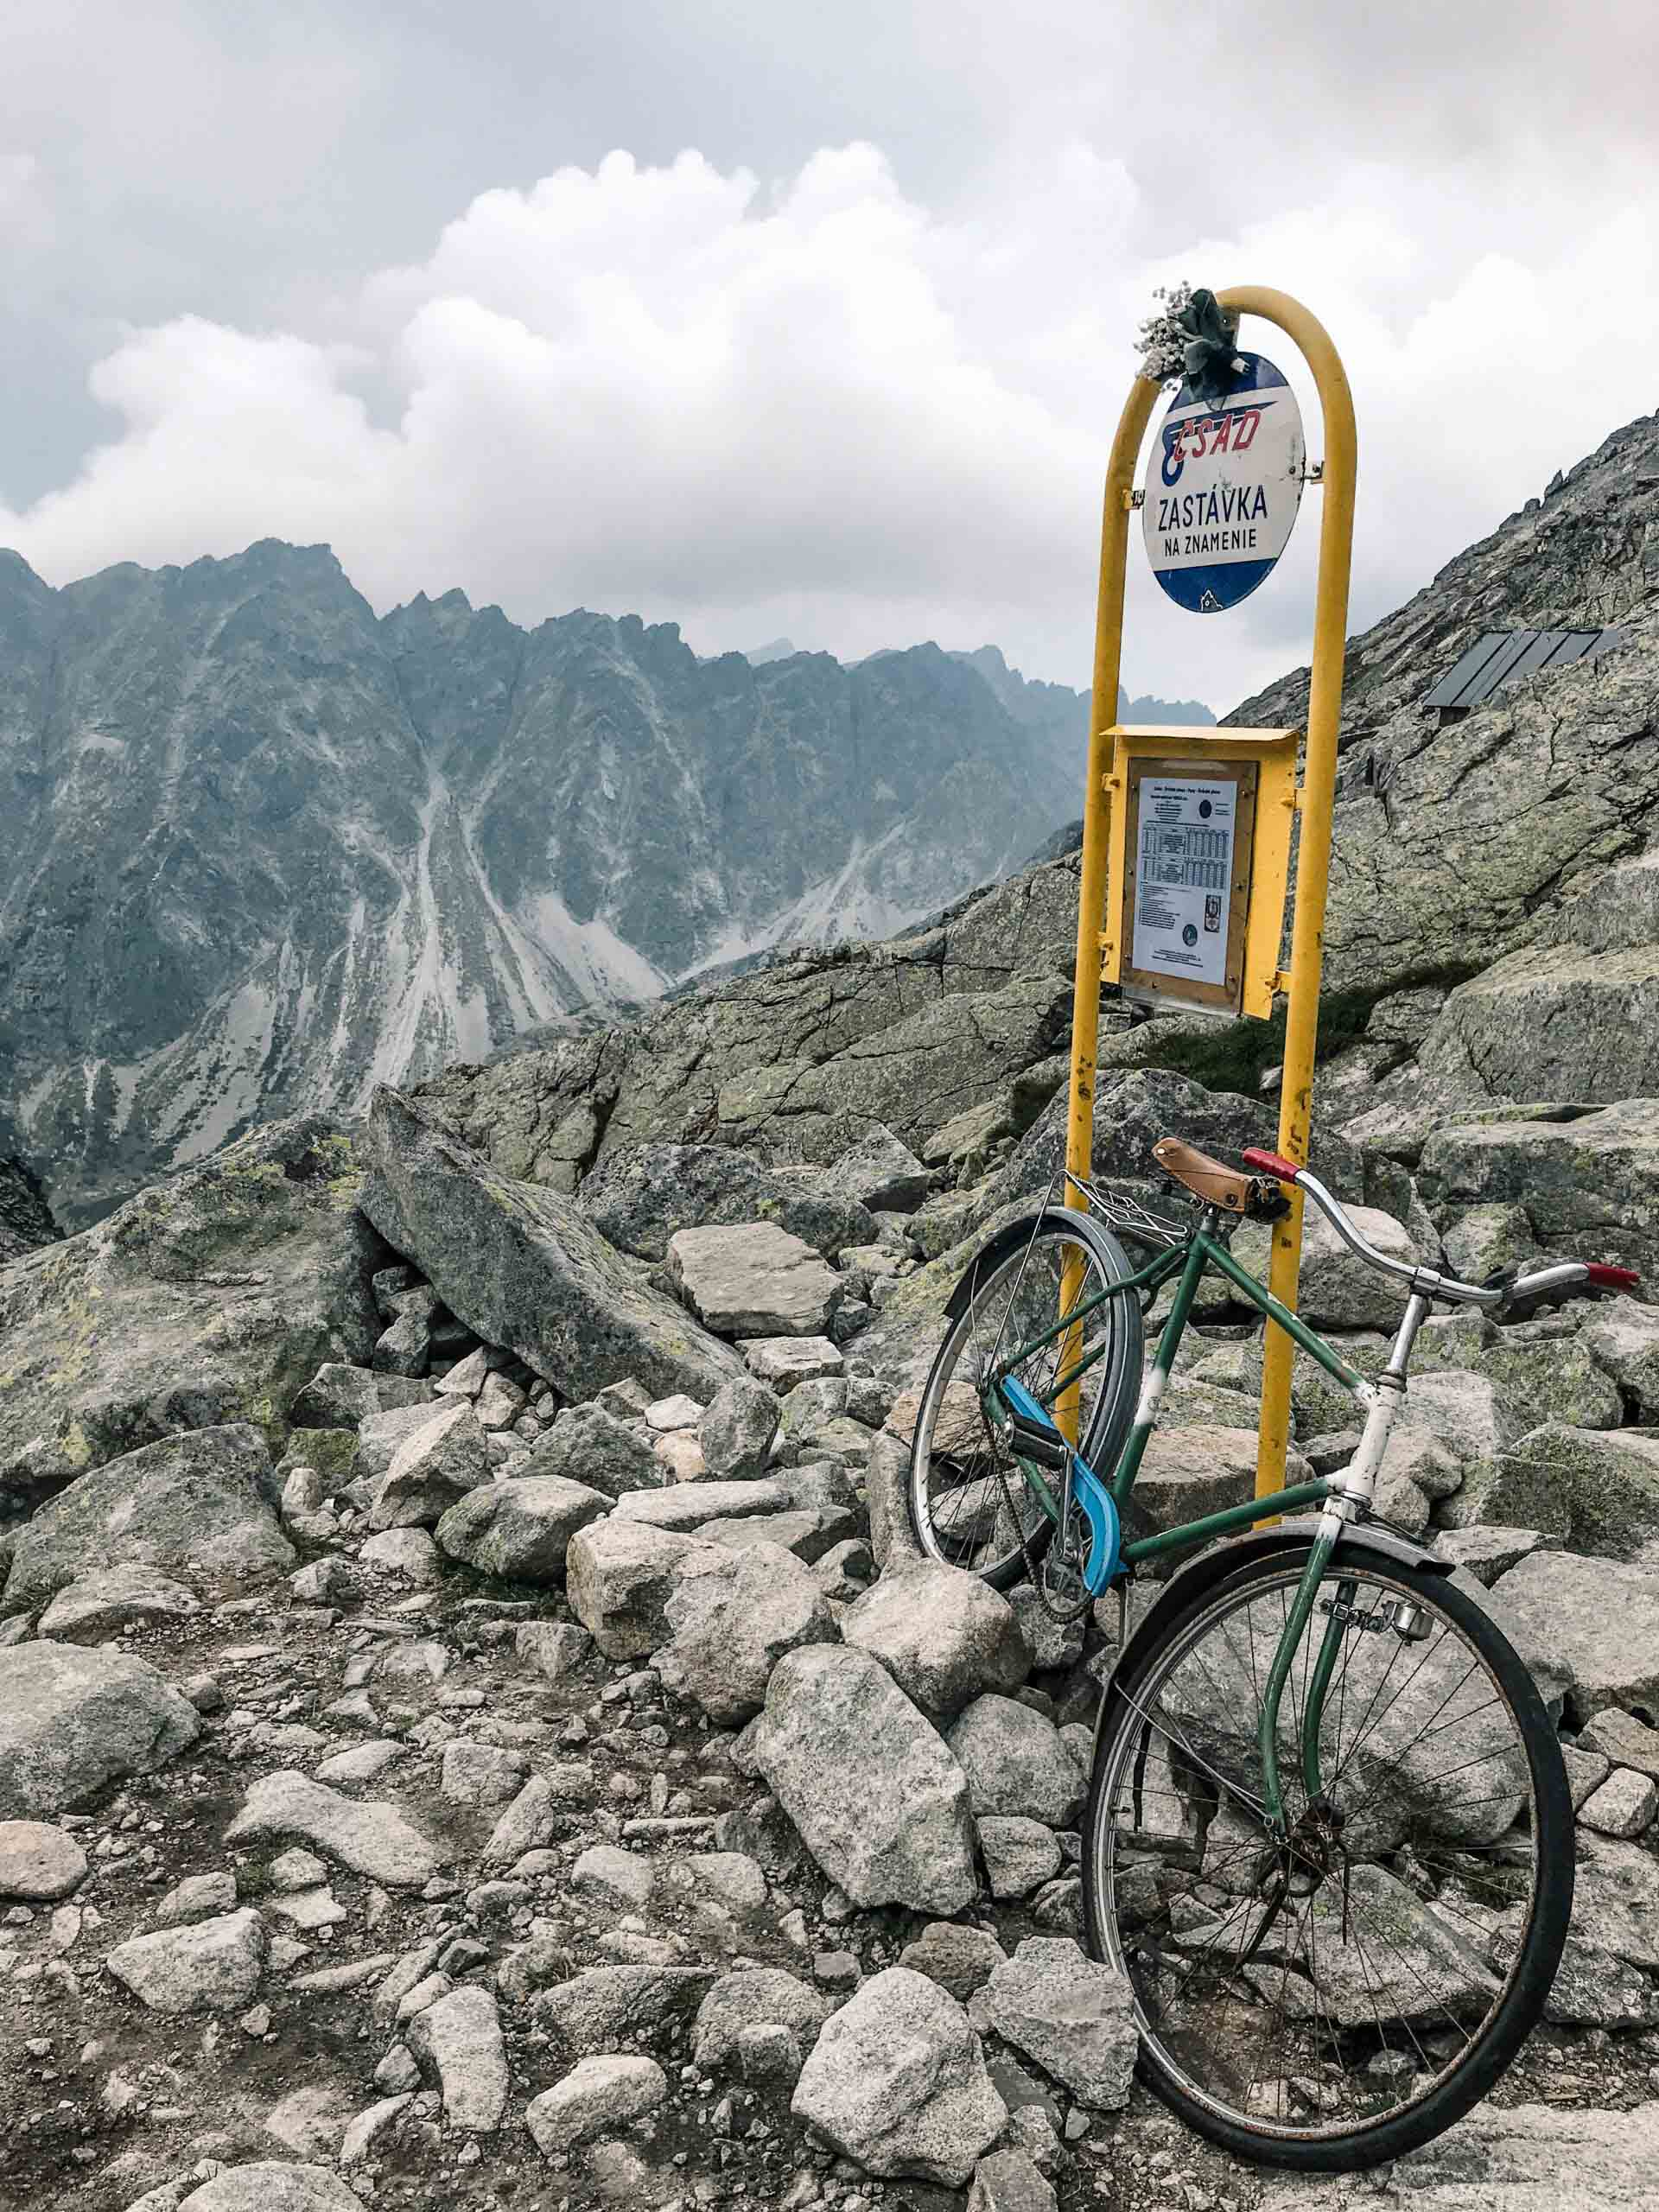 Výstup na Rysy - Vysoké Tatry - Jiráci na cestách